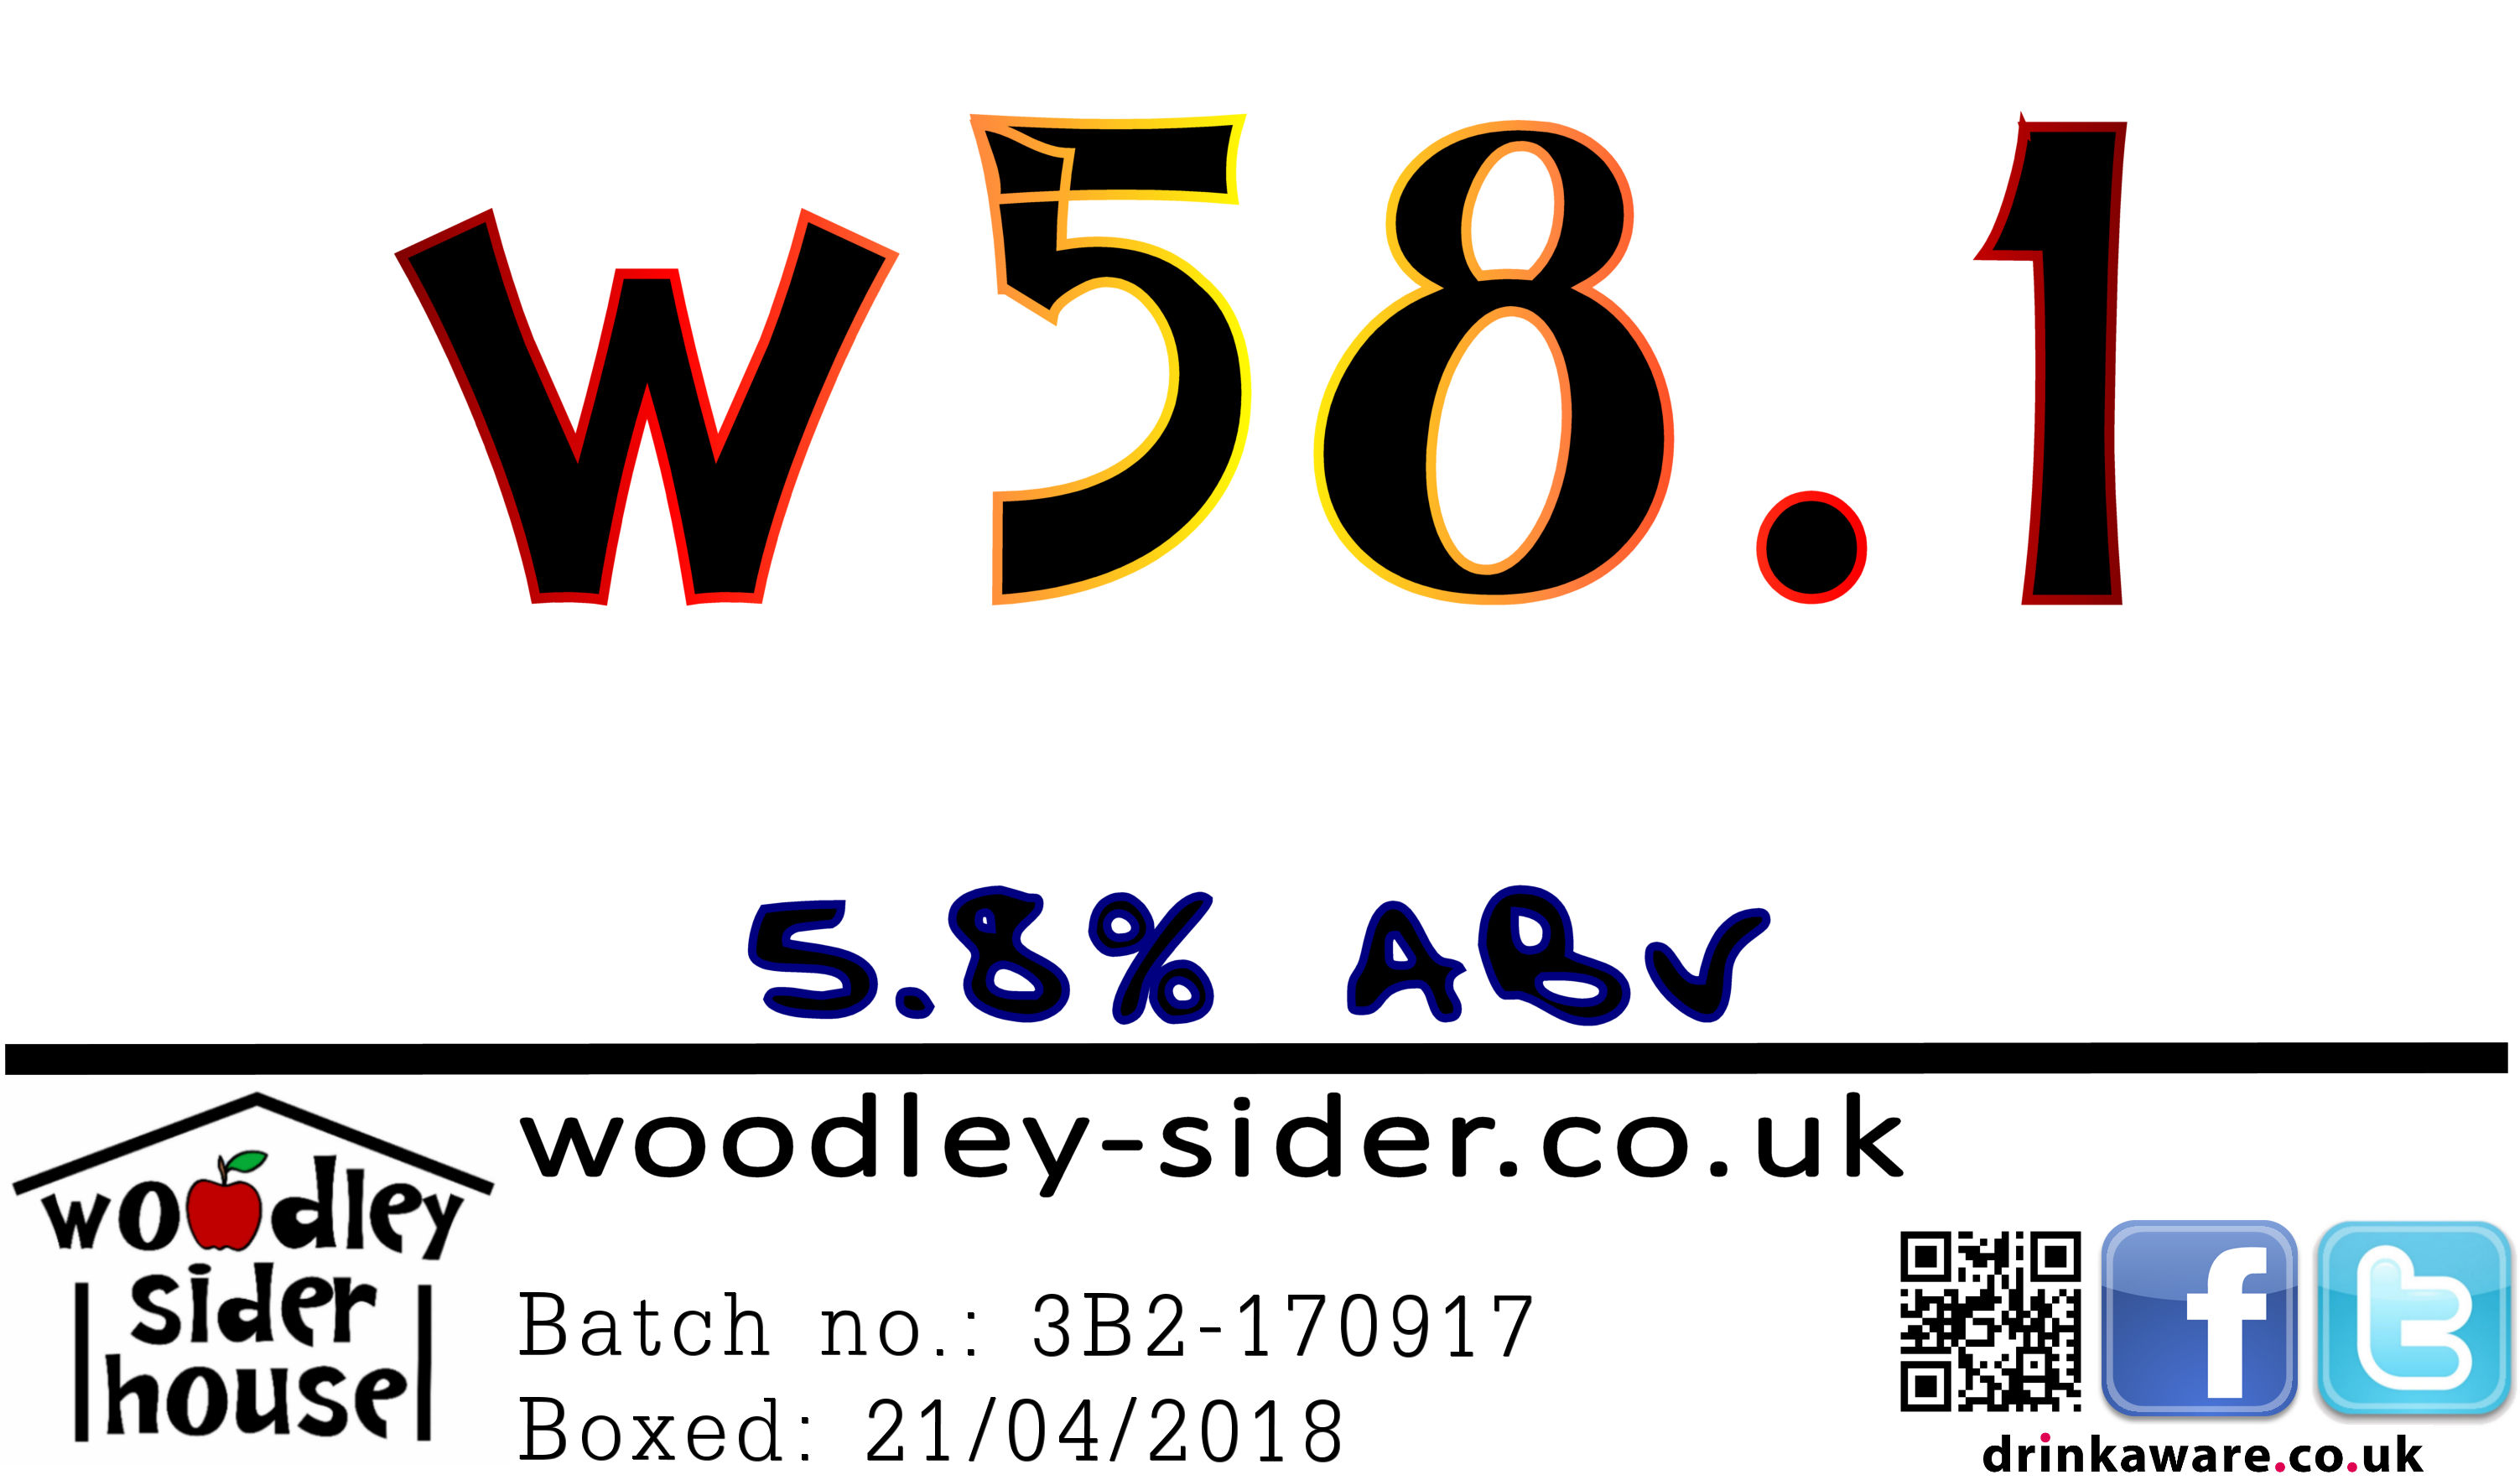 W58.1